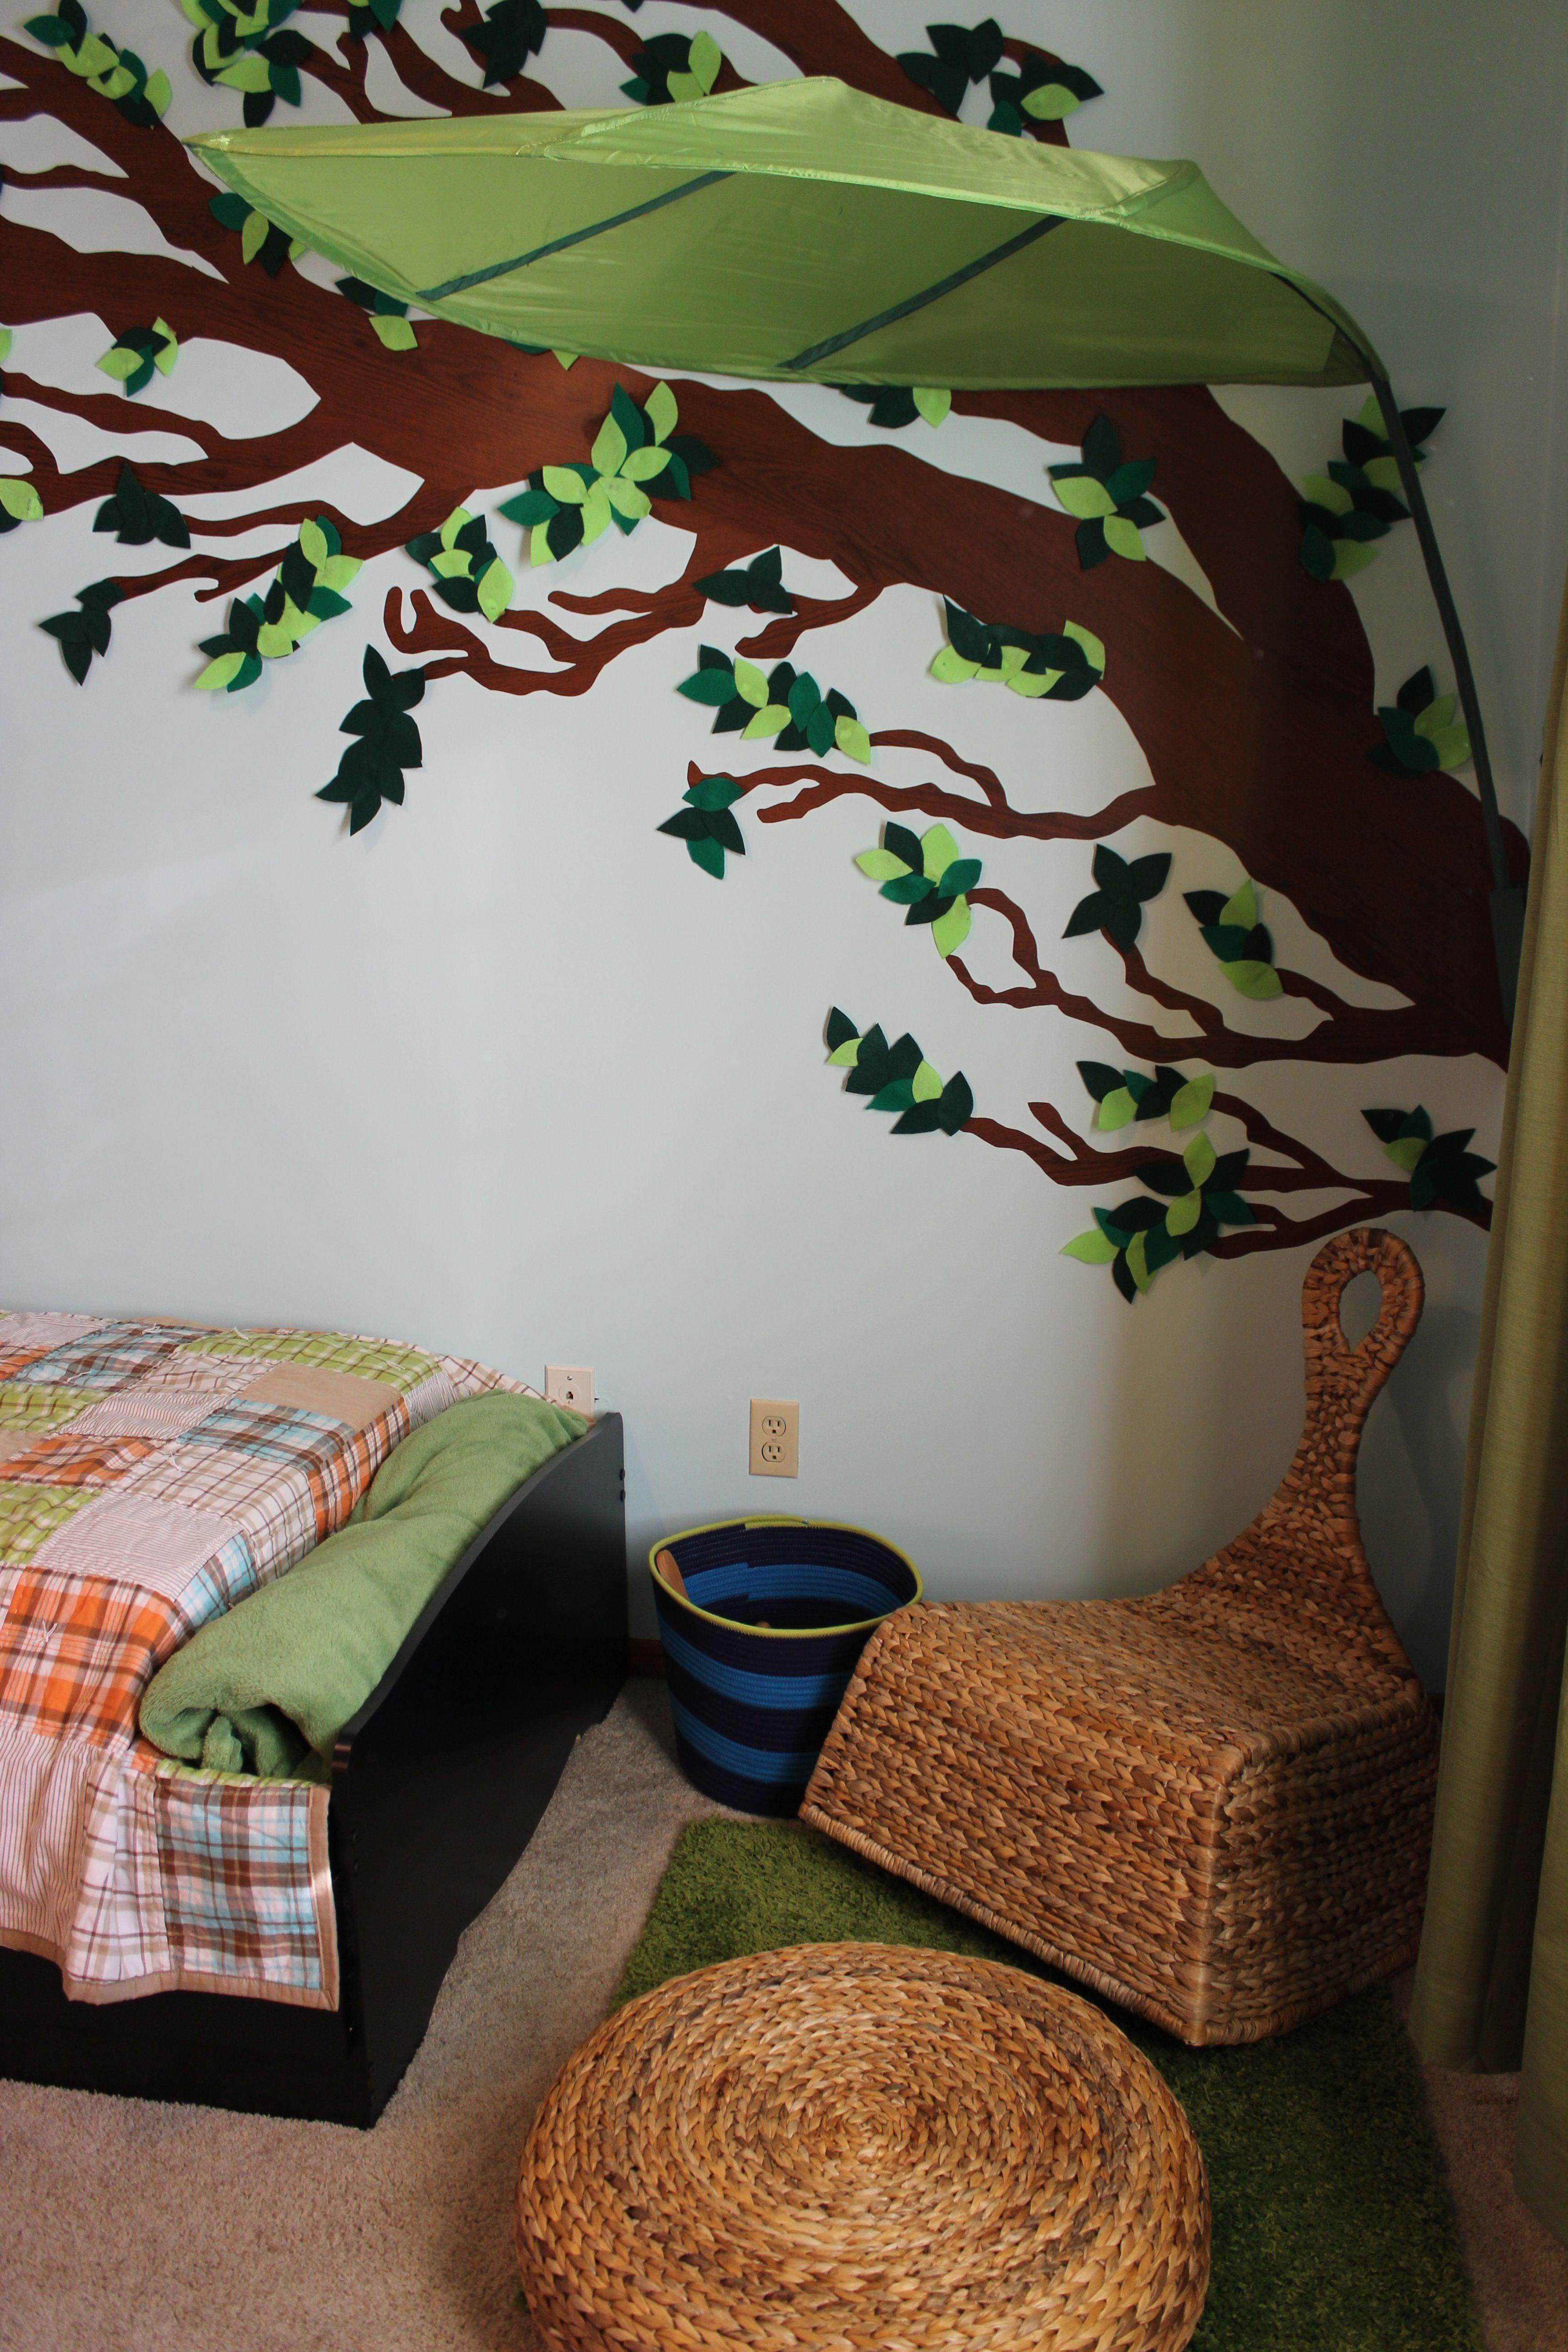 new ikea green leaf shaped bed canopy wall decoration make kids